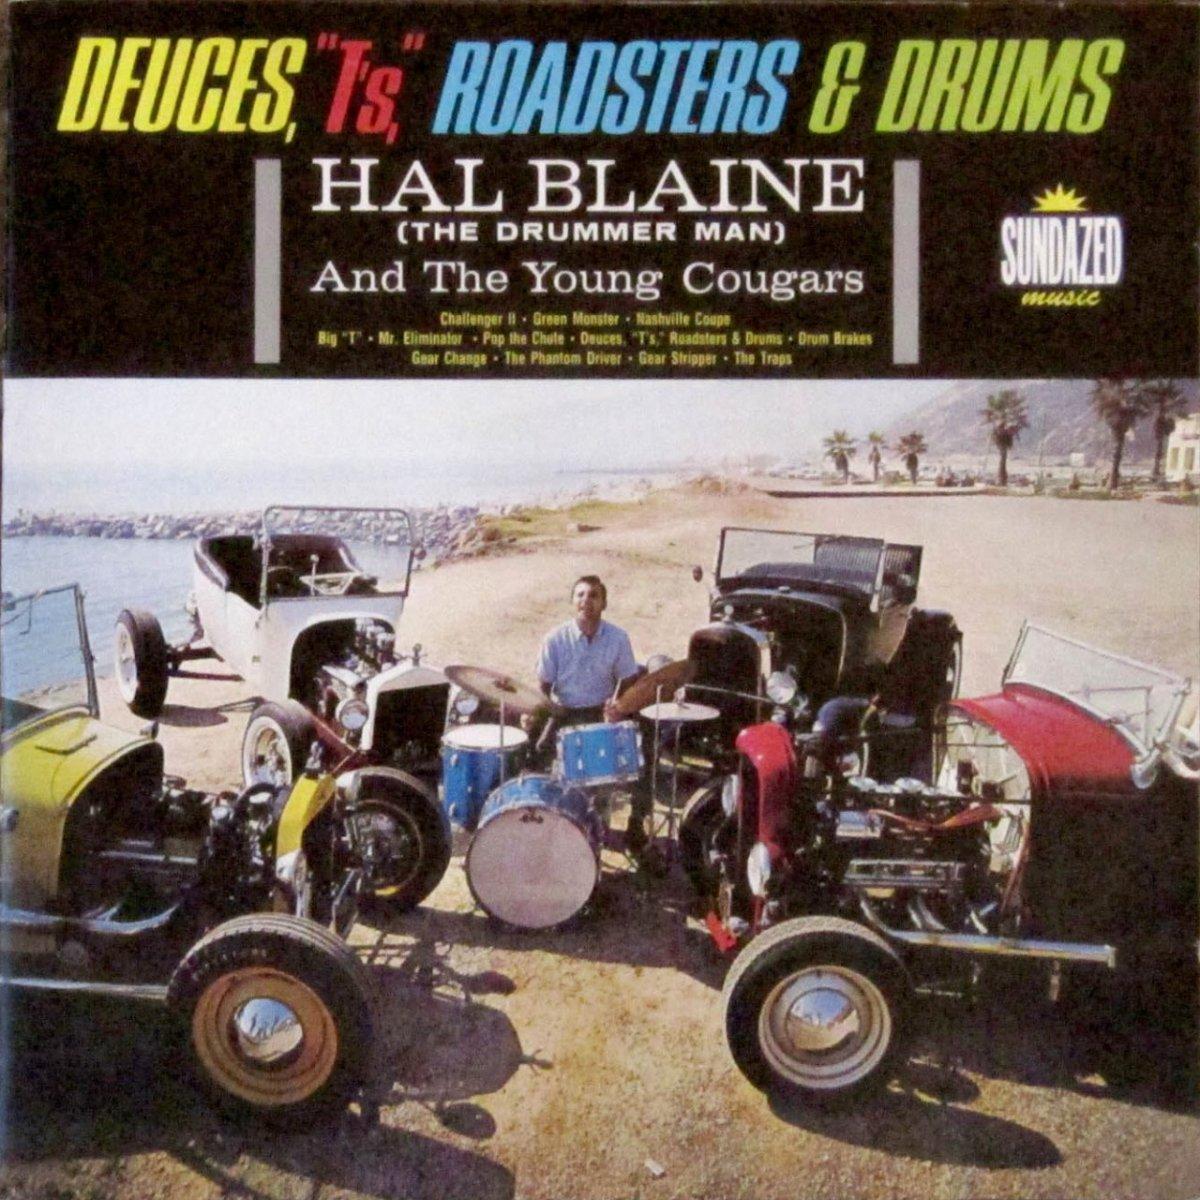 Tom Booth '30 Model A Roadster (Hal Blaine Album cover).jpg